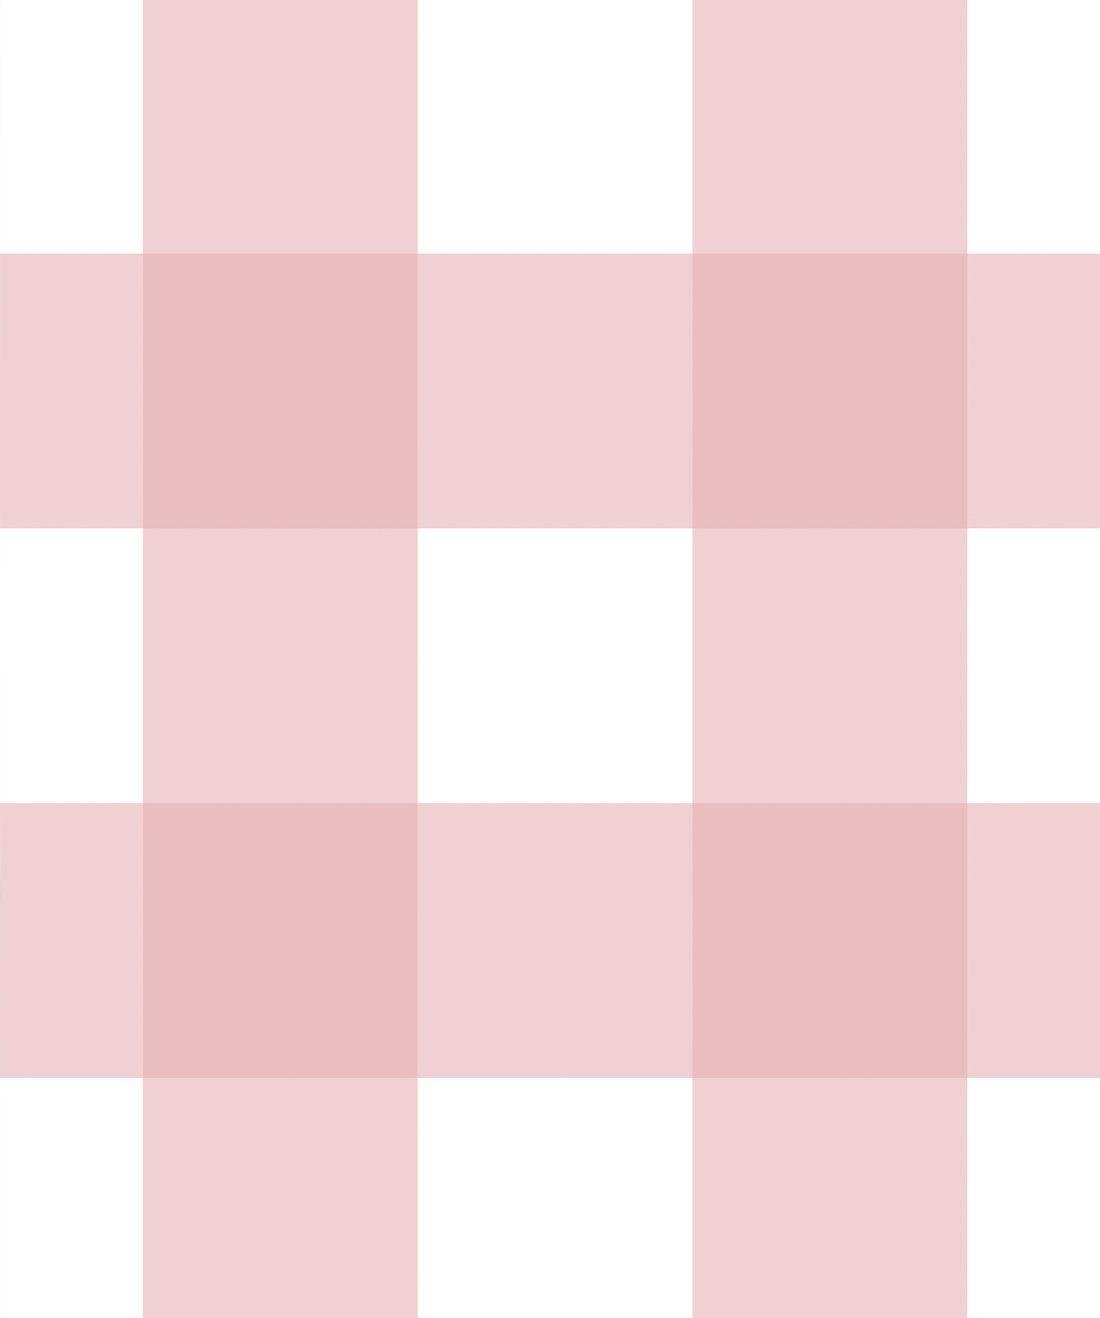 Mel S Buffalo Check Wallpaper In 2021 Valentines Wallpaper Valentines Wallpaper Iphone Easter Wallpaper